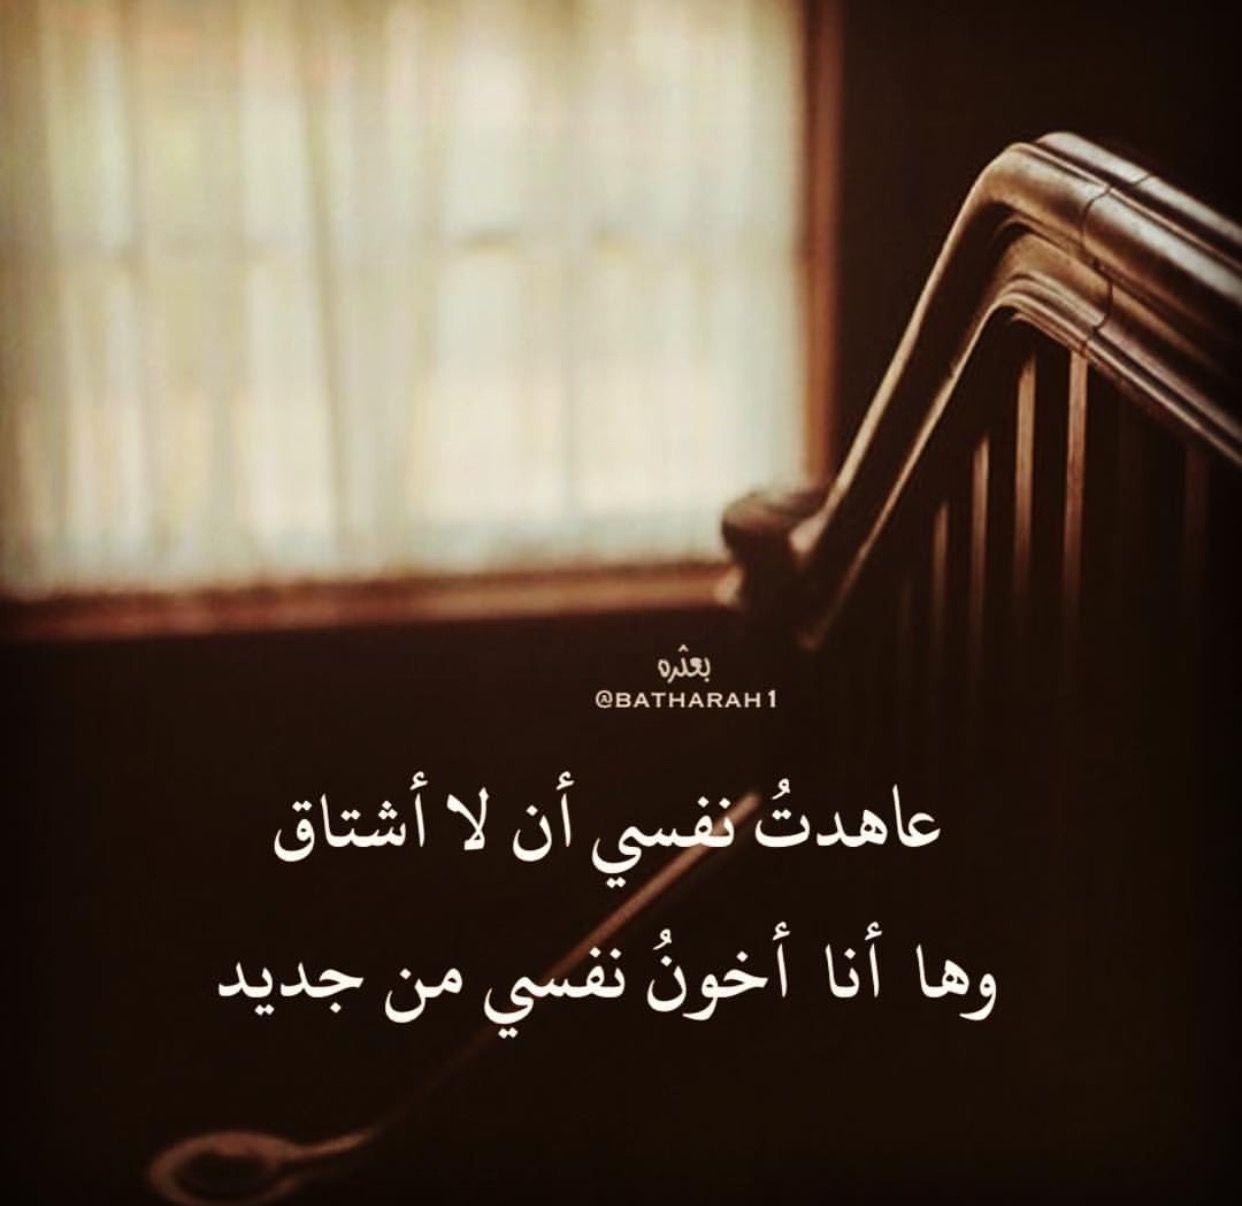 أخون نفسي Kahlil Gibran Quotes Words Quotes